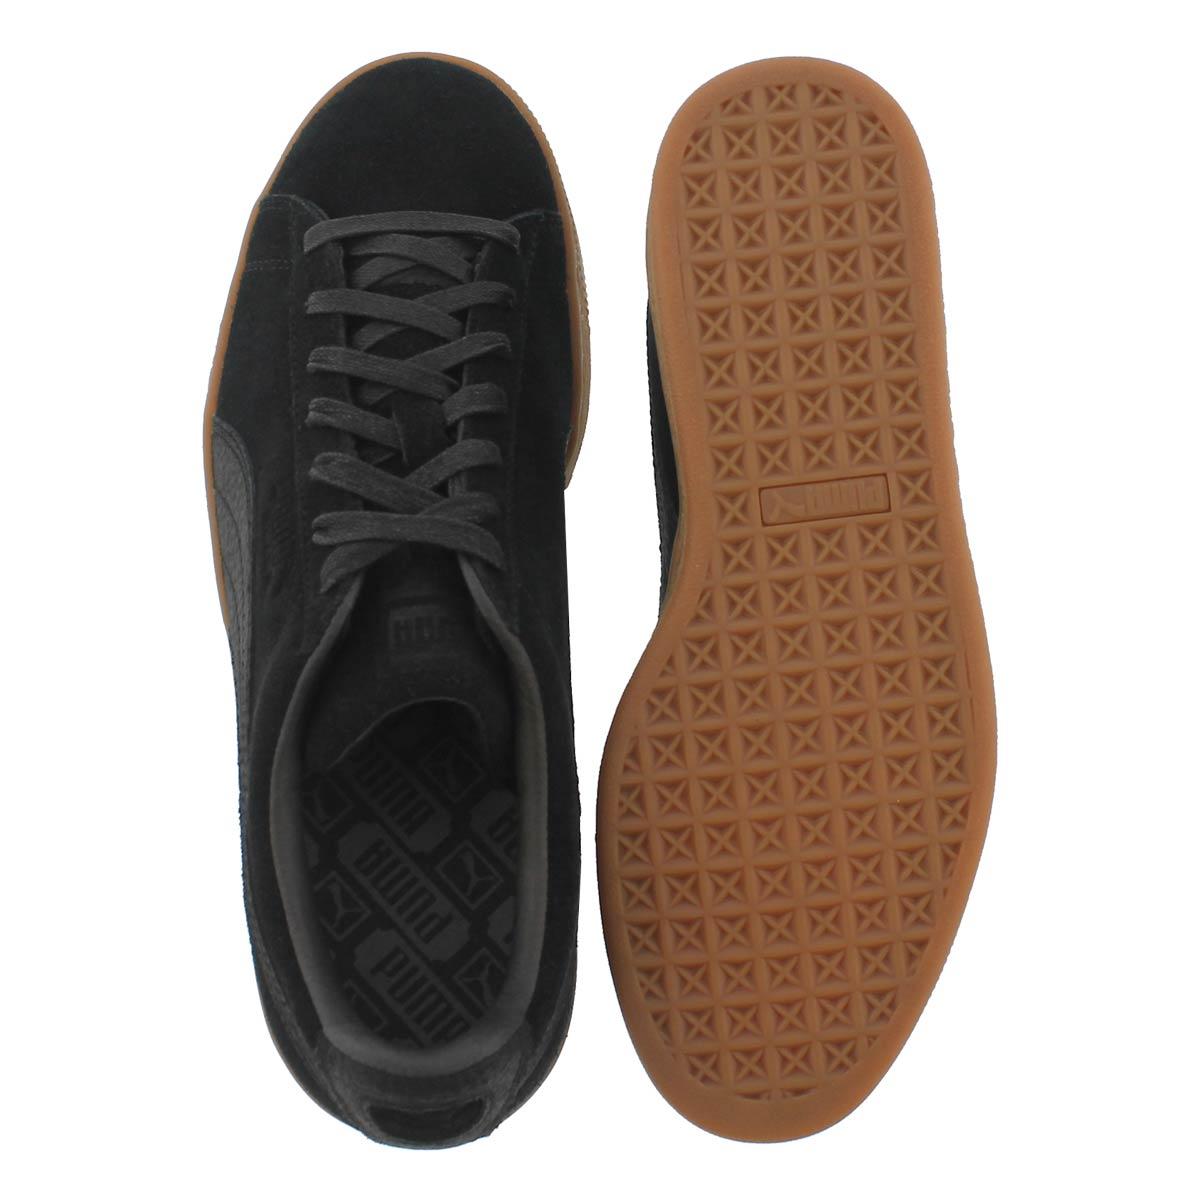 Mns ClassicNaturalWarmth black sneaker